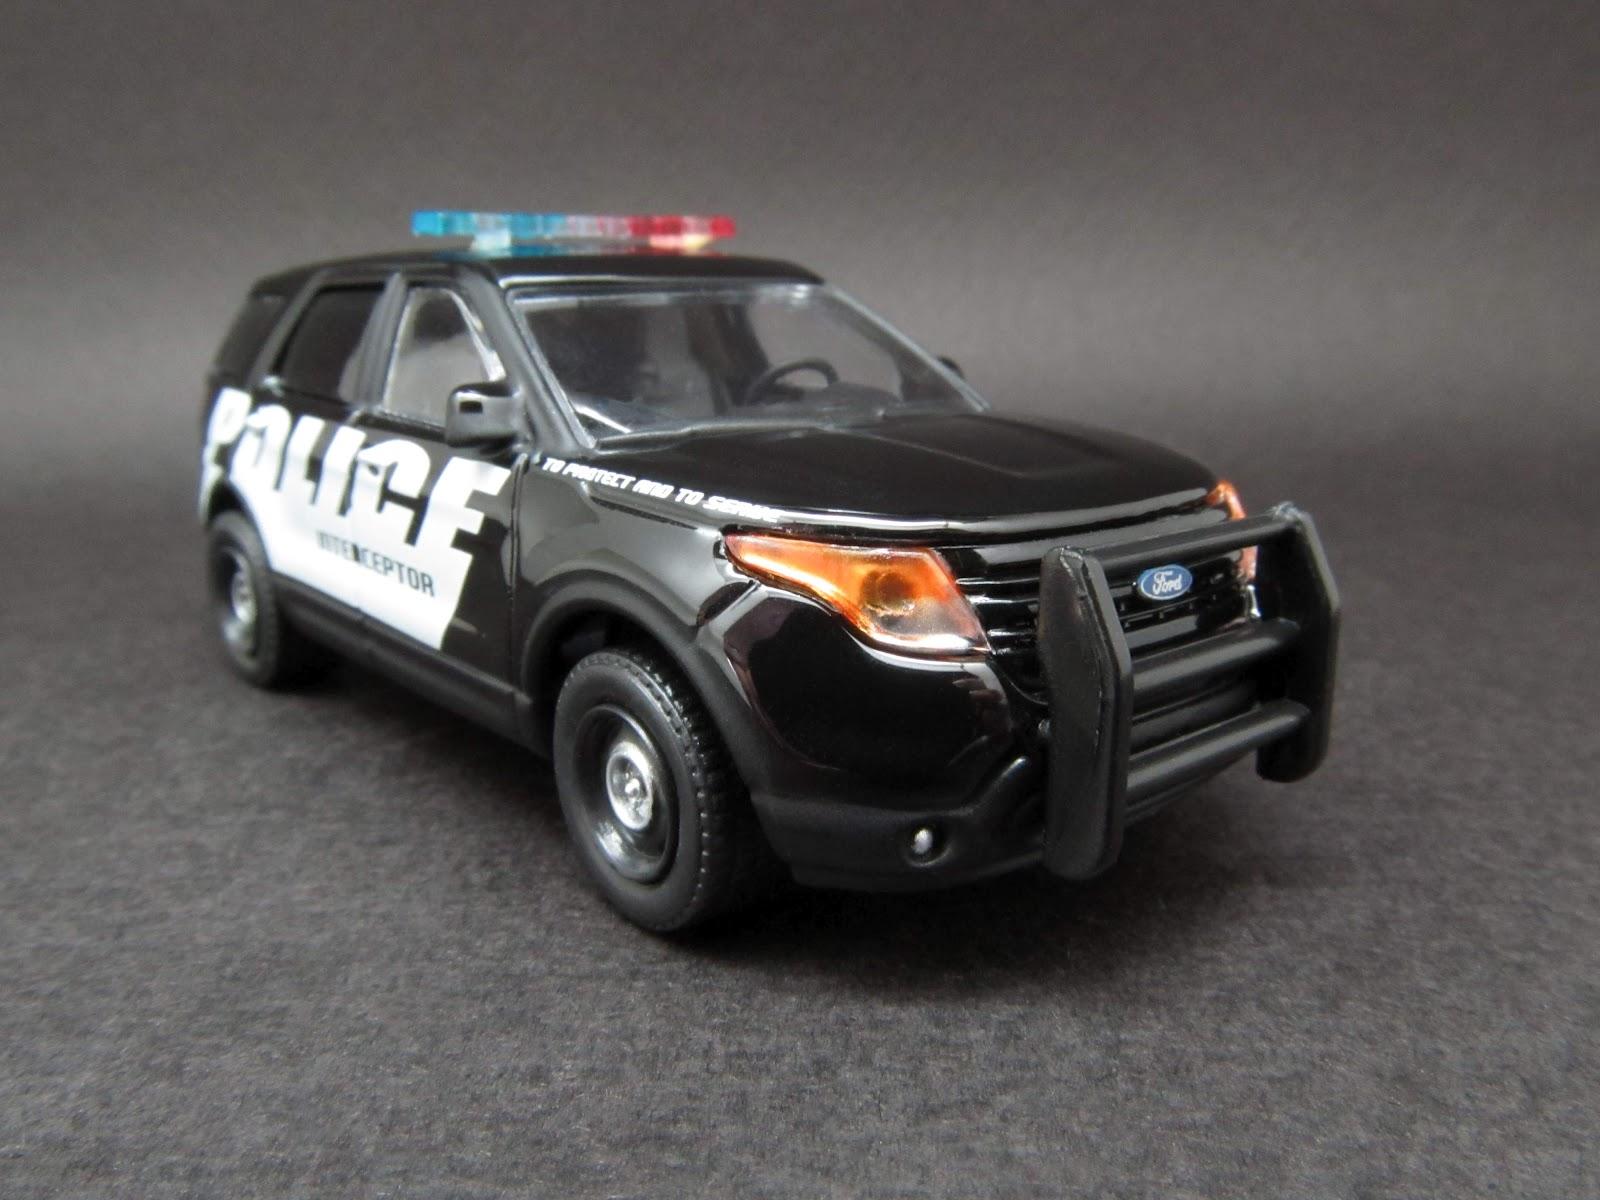 Diecast Hobbist 2013 Ford Explorer Ford Police